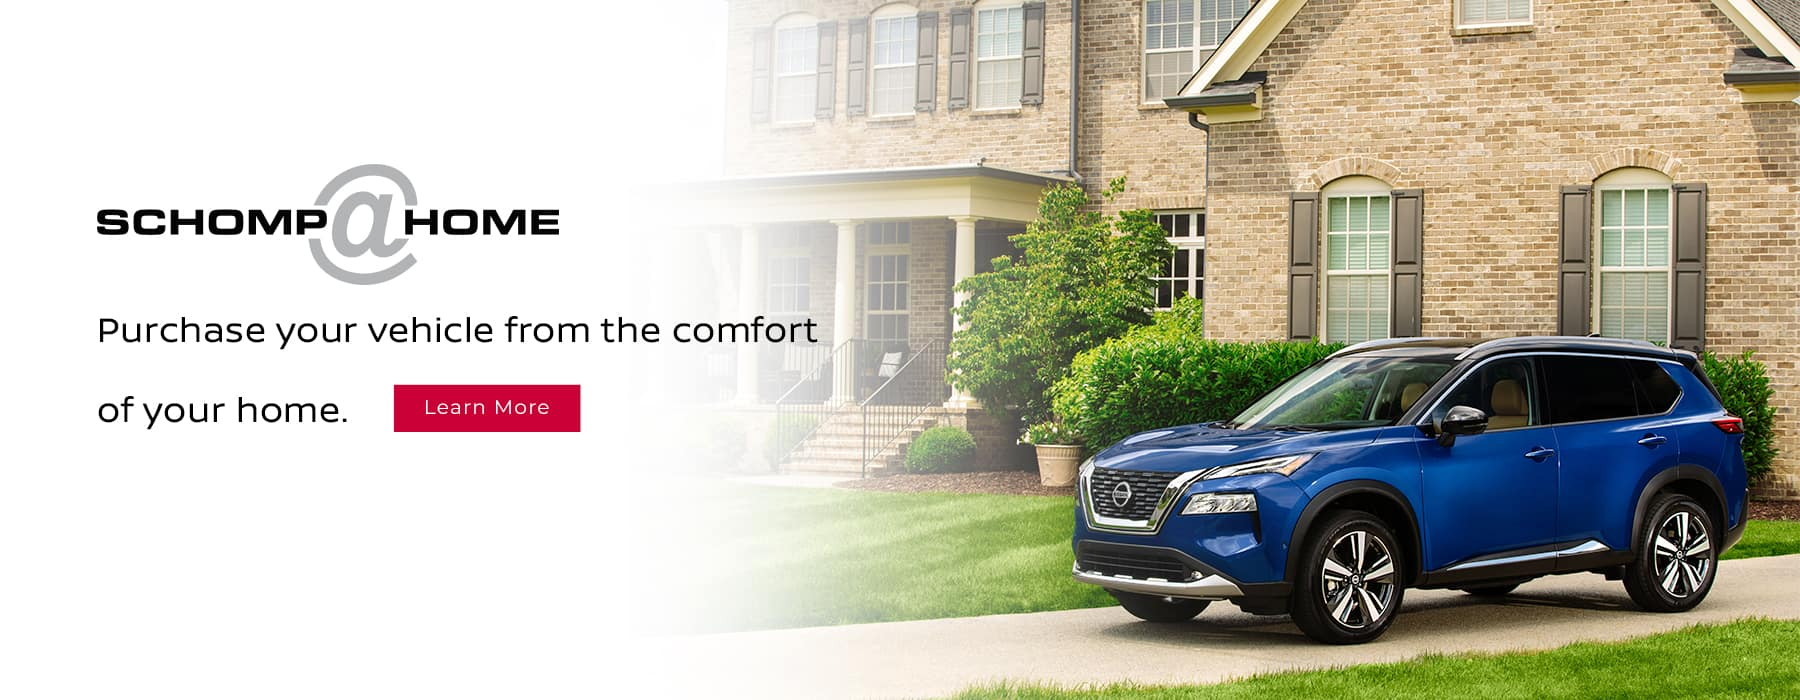 Schomp-at-Home-Homepagebanner-Nissan